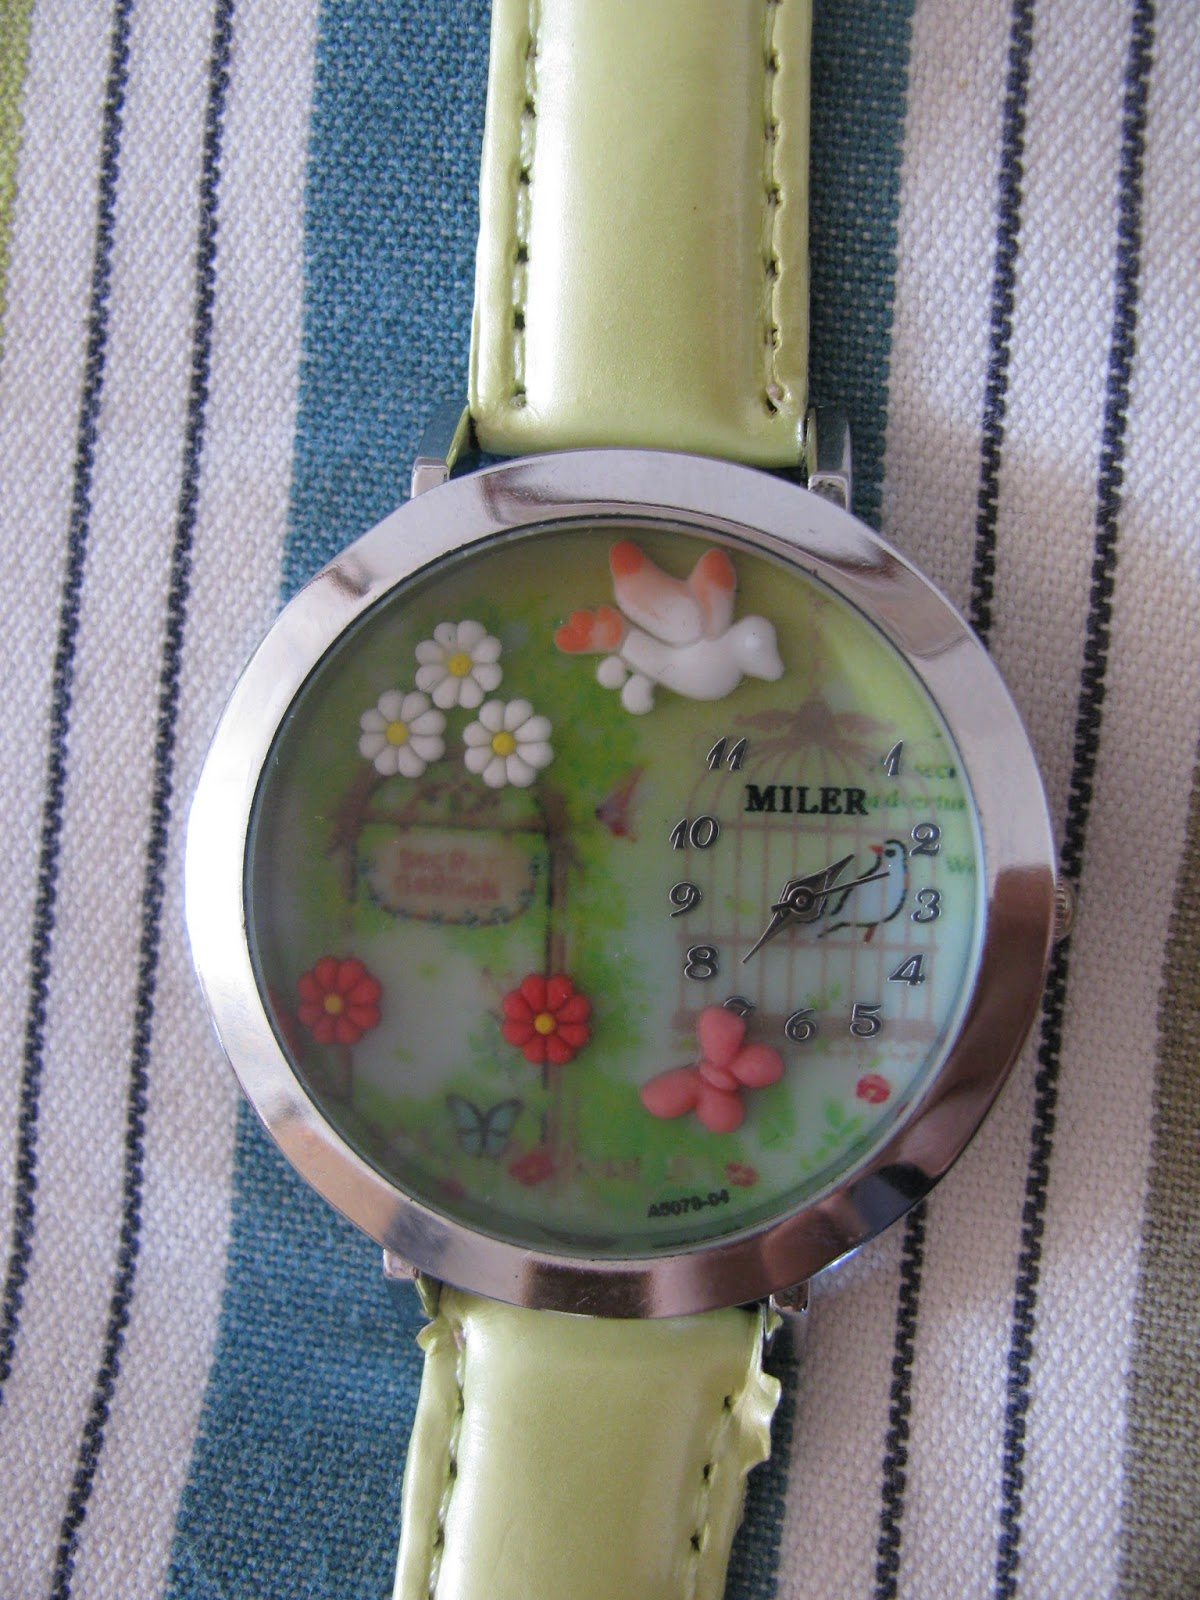 e9f06ff3c59 Armas roheline kell. Roheline on ka minu lemmikvärv (: Cute and girly  watch. Green is also my favourite colour!